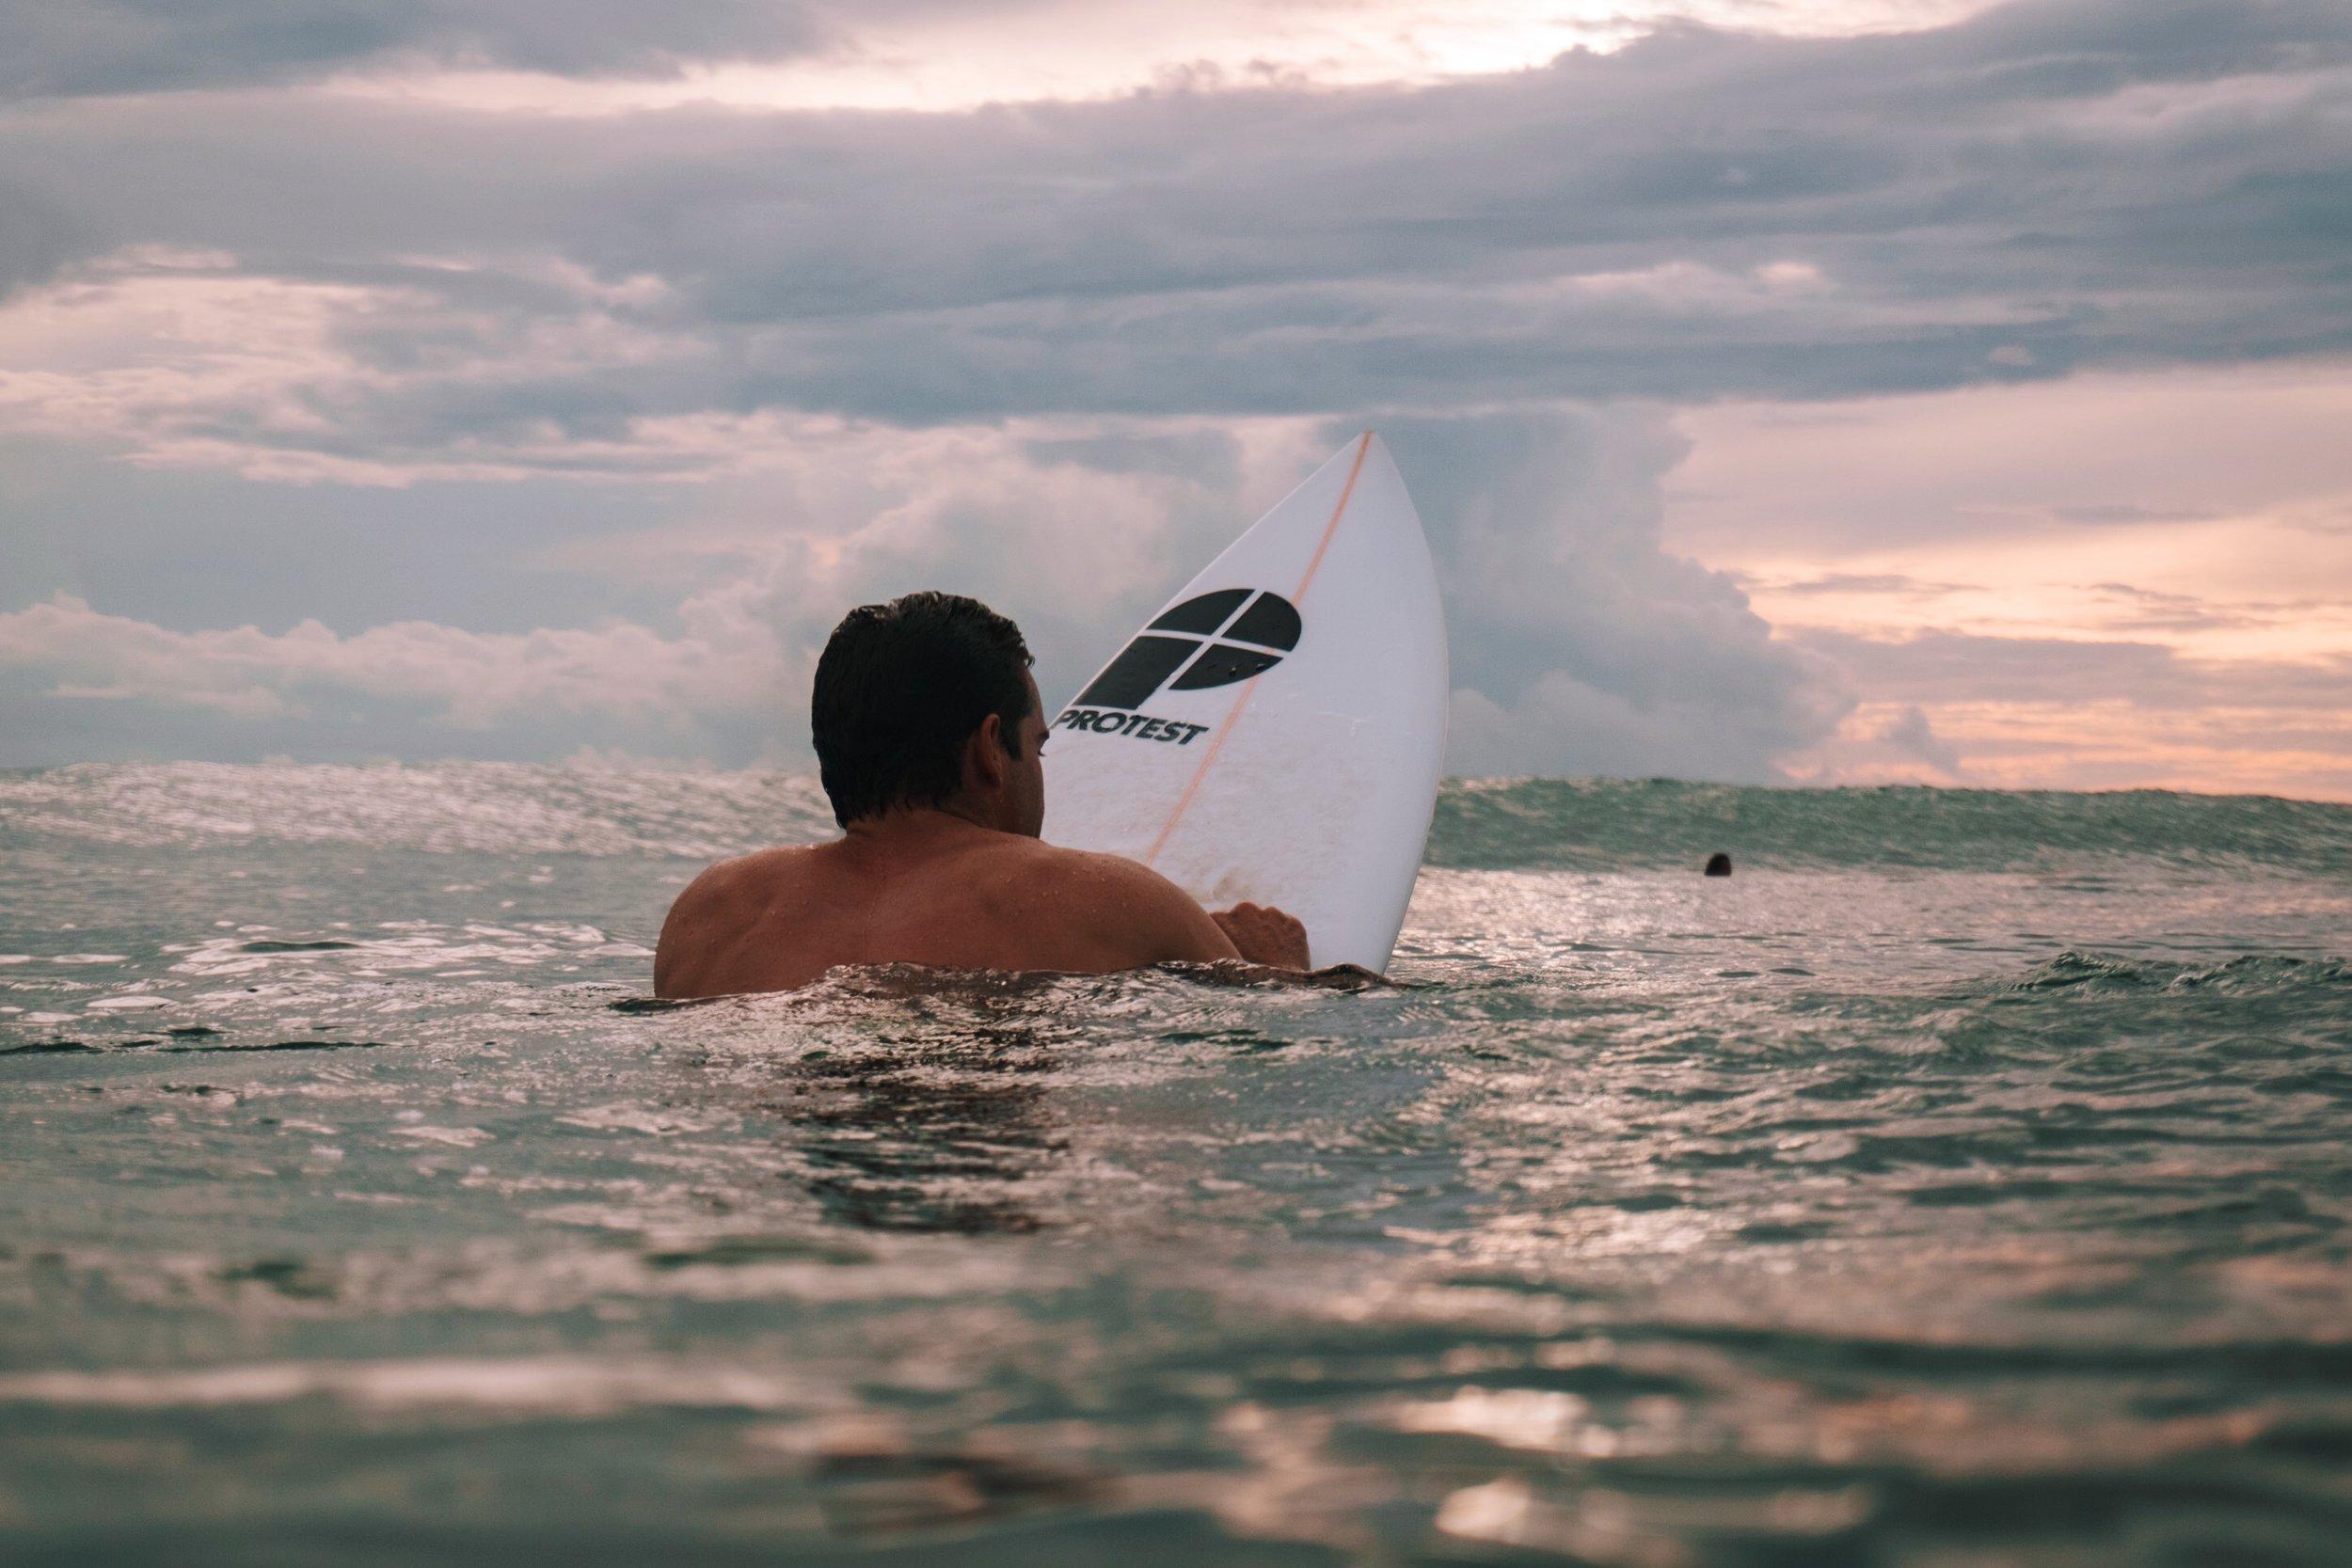 Tristan-Guibald-Surf-México-Sayulita-Pascuales-Zihuatanejo-Fotografía-Heiko-Bothe-10.JPG